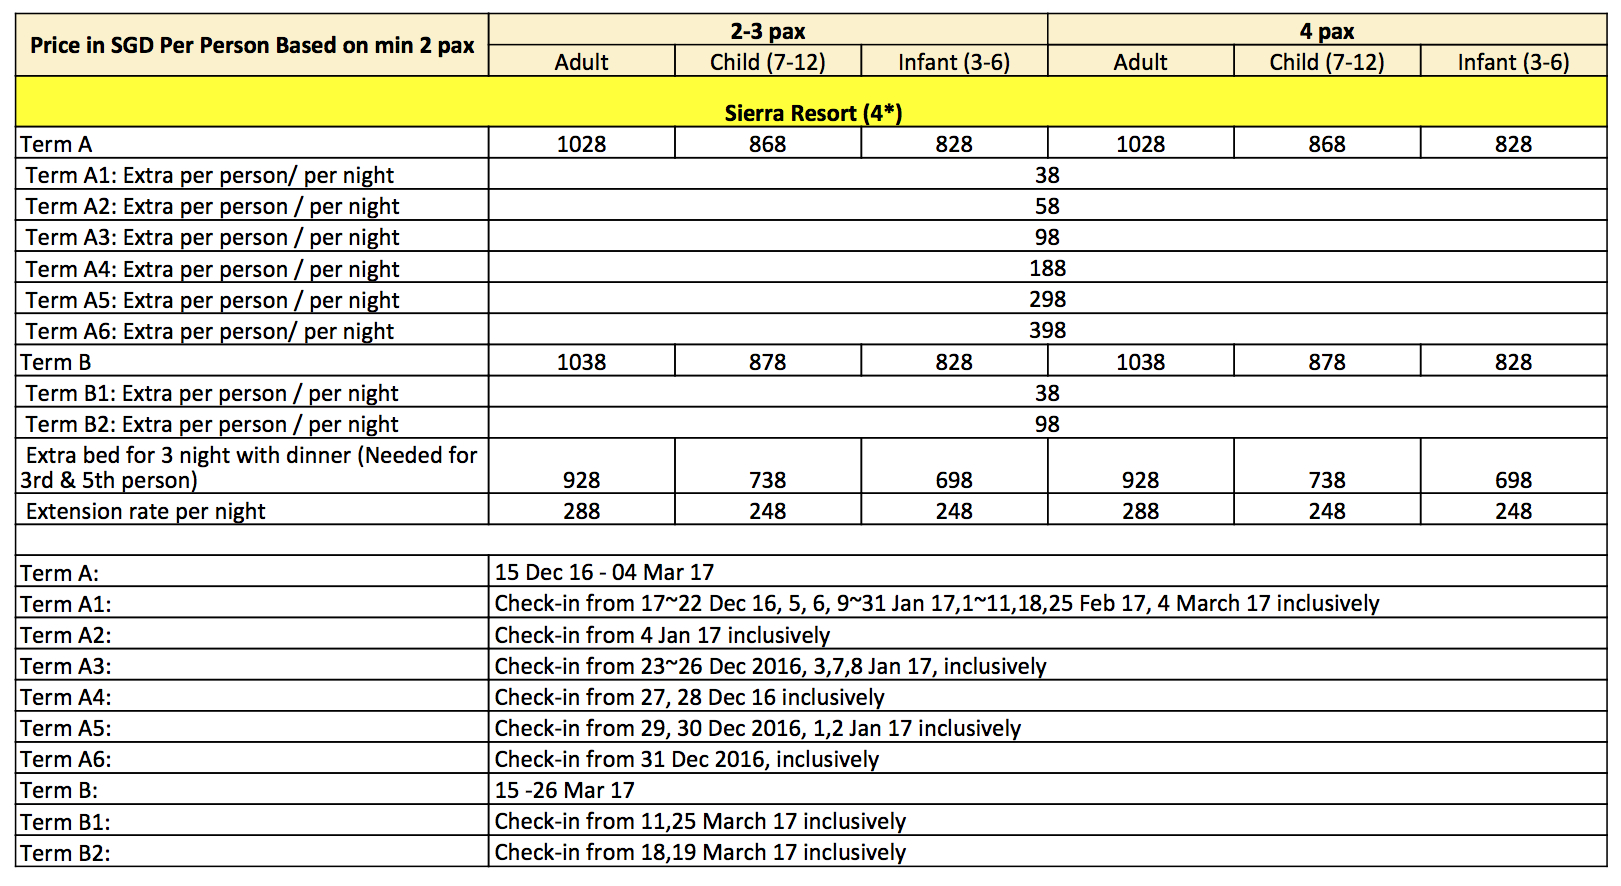 japan-hakuba-pricing-2016-rsp-4star